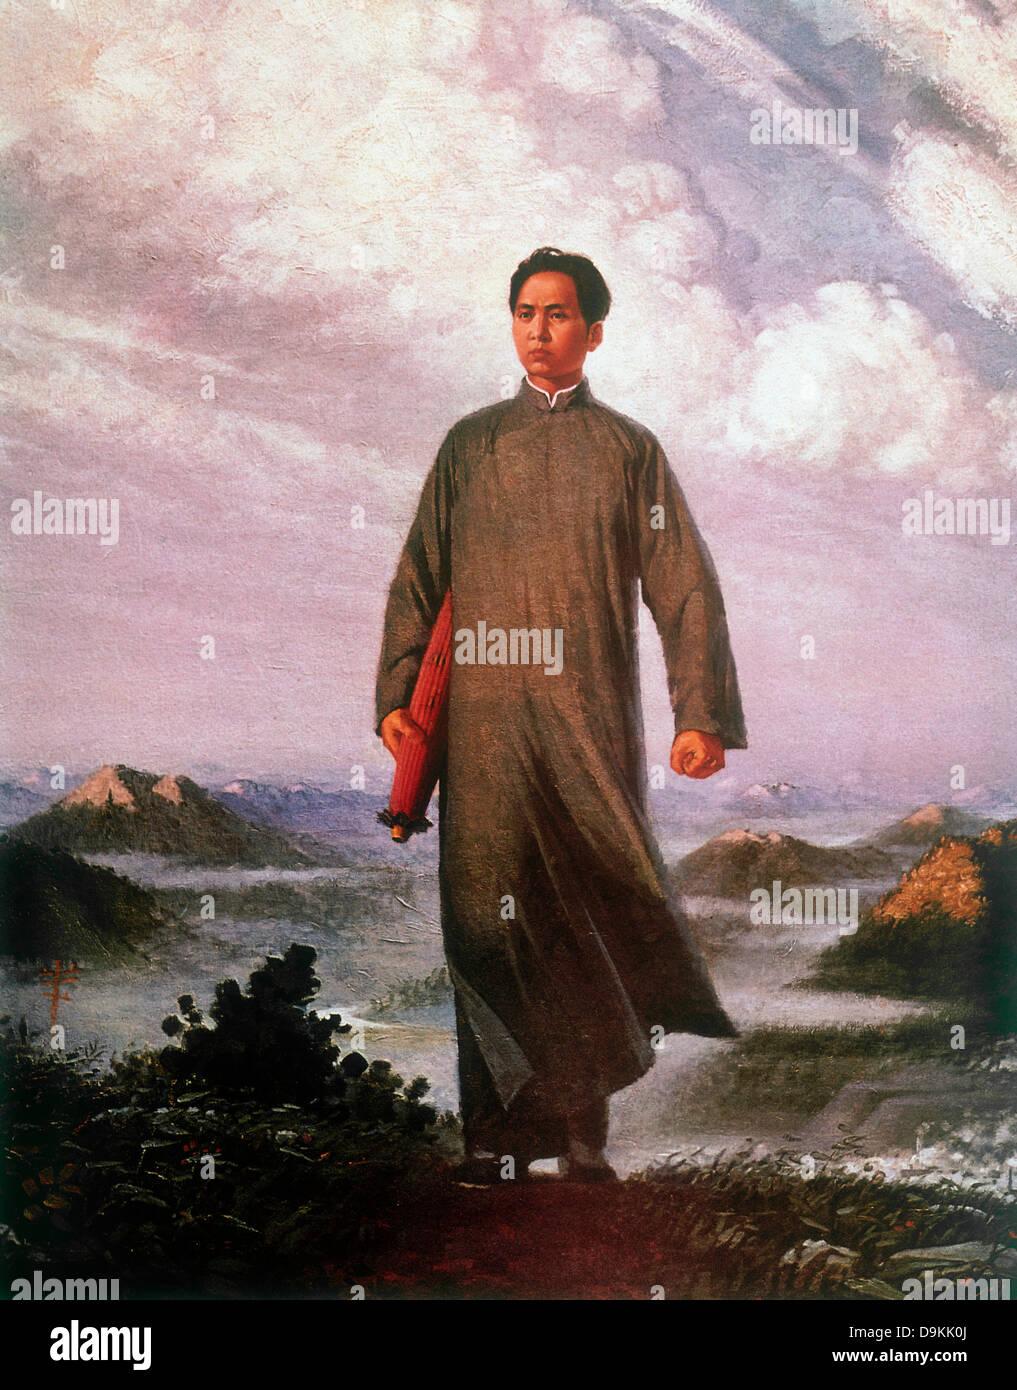 Mao tse tung Photo Stock